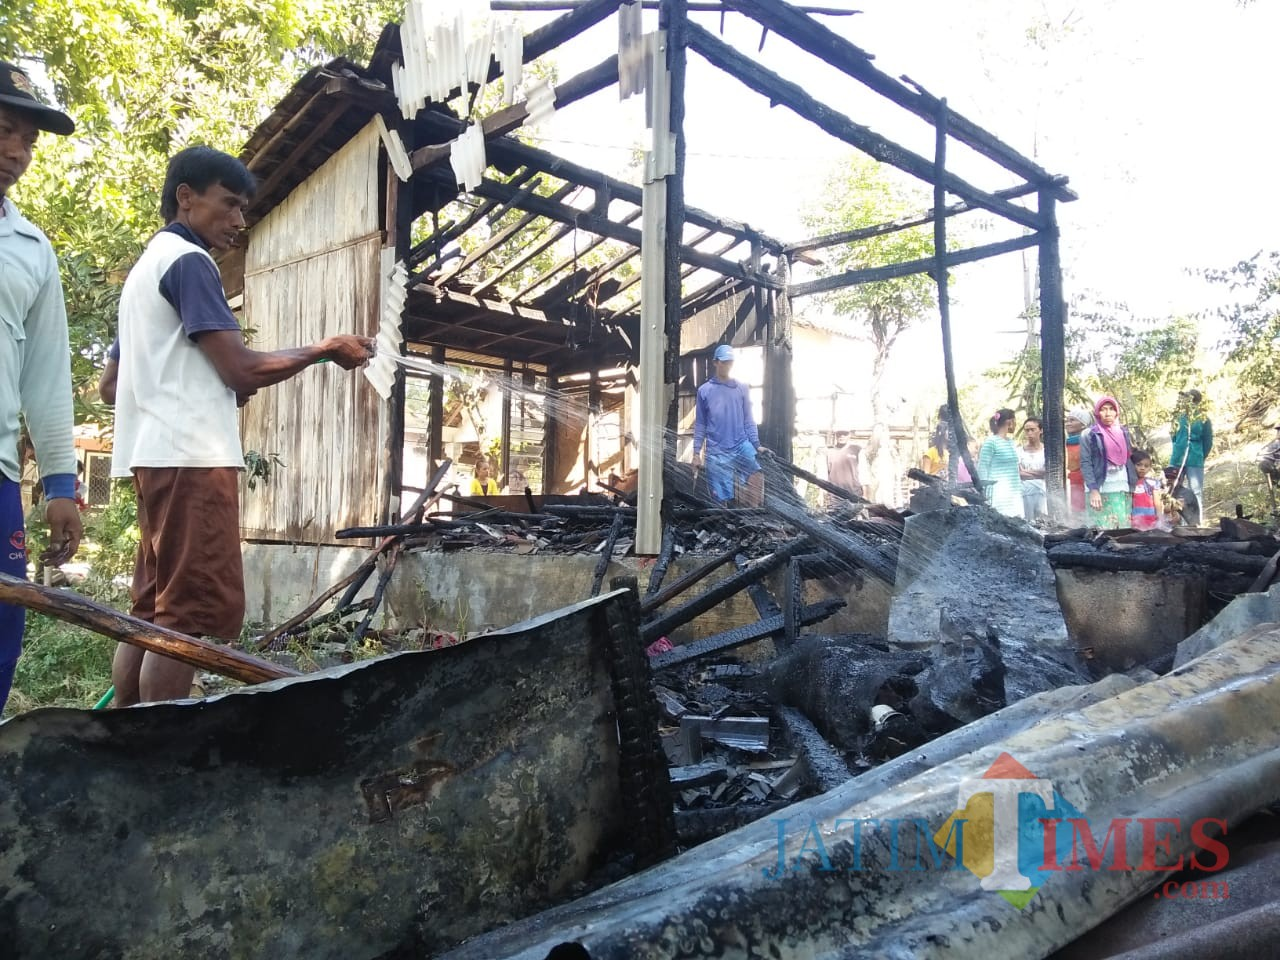 Kebakaran rumah milik milik Hadiono warga Dusun Blangguan RT. 001 RW. 007 Desa Sumberwaru, Kecamatan Banyutih (Foto Istimewa)